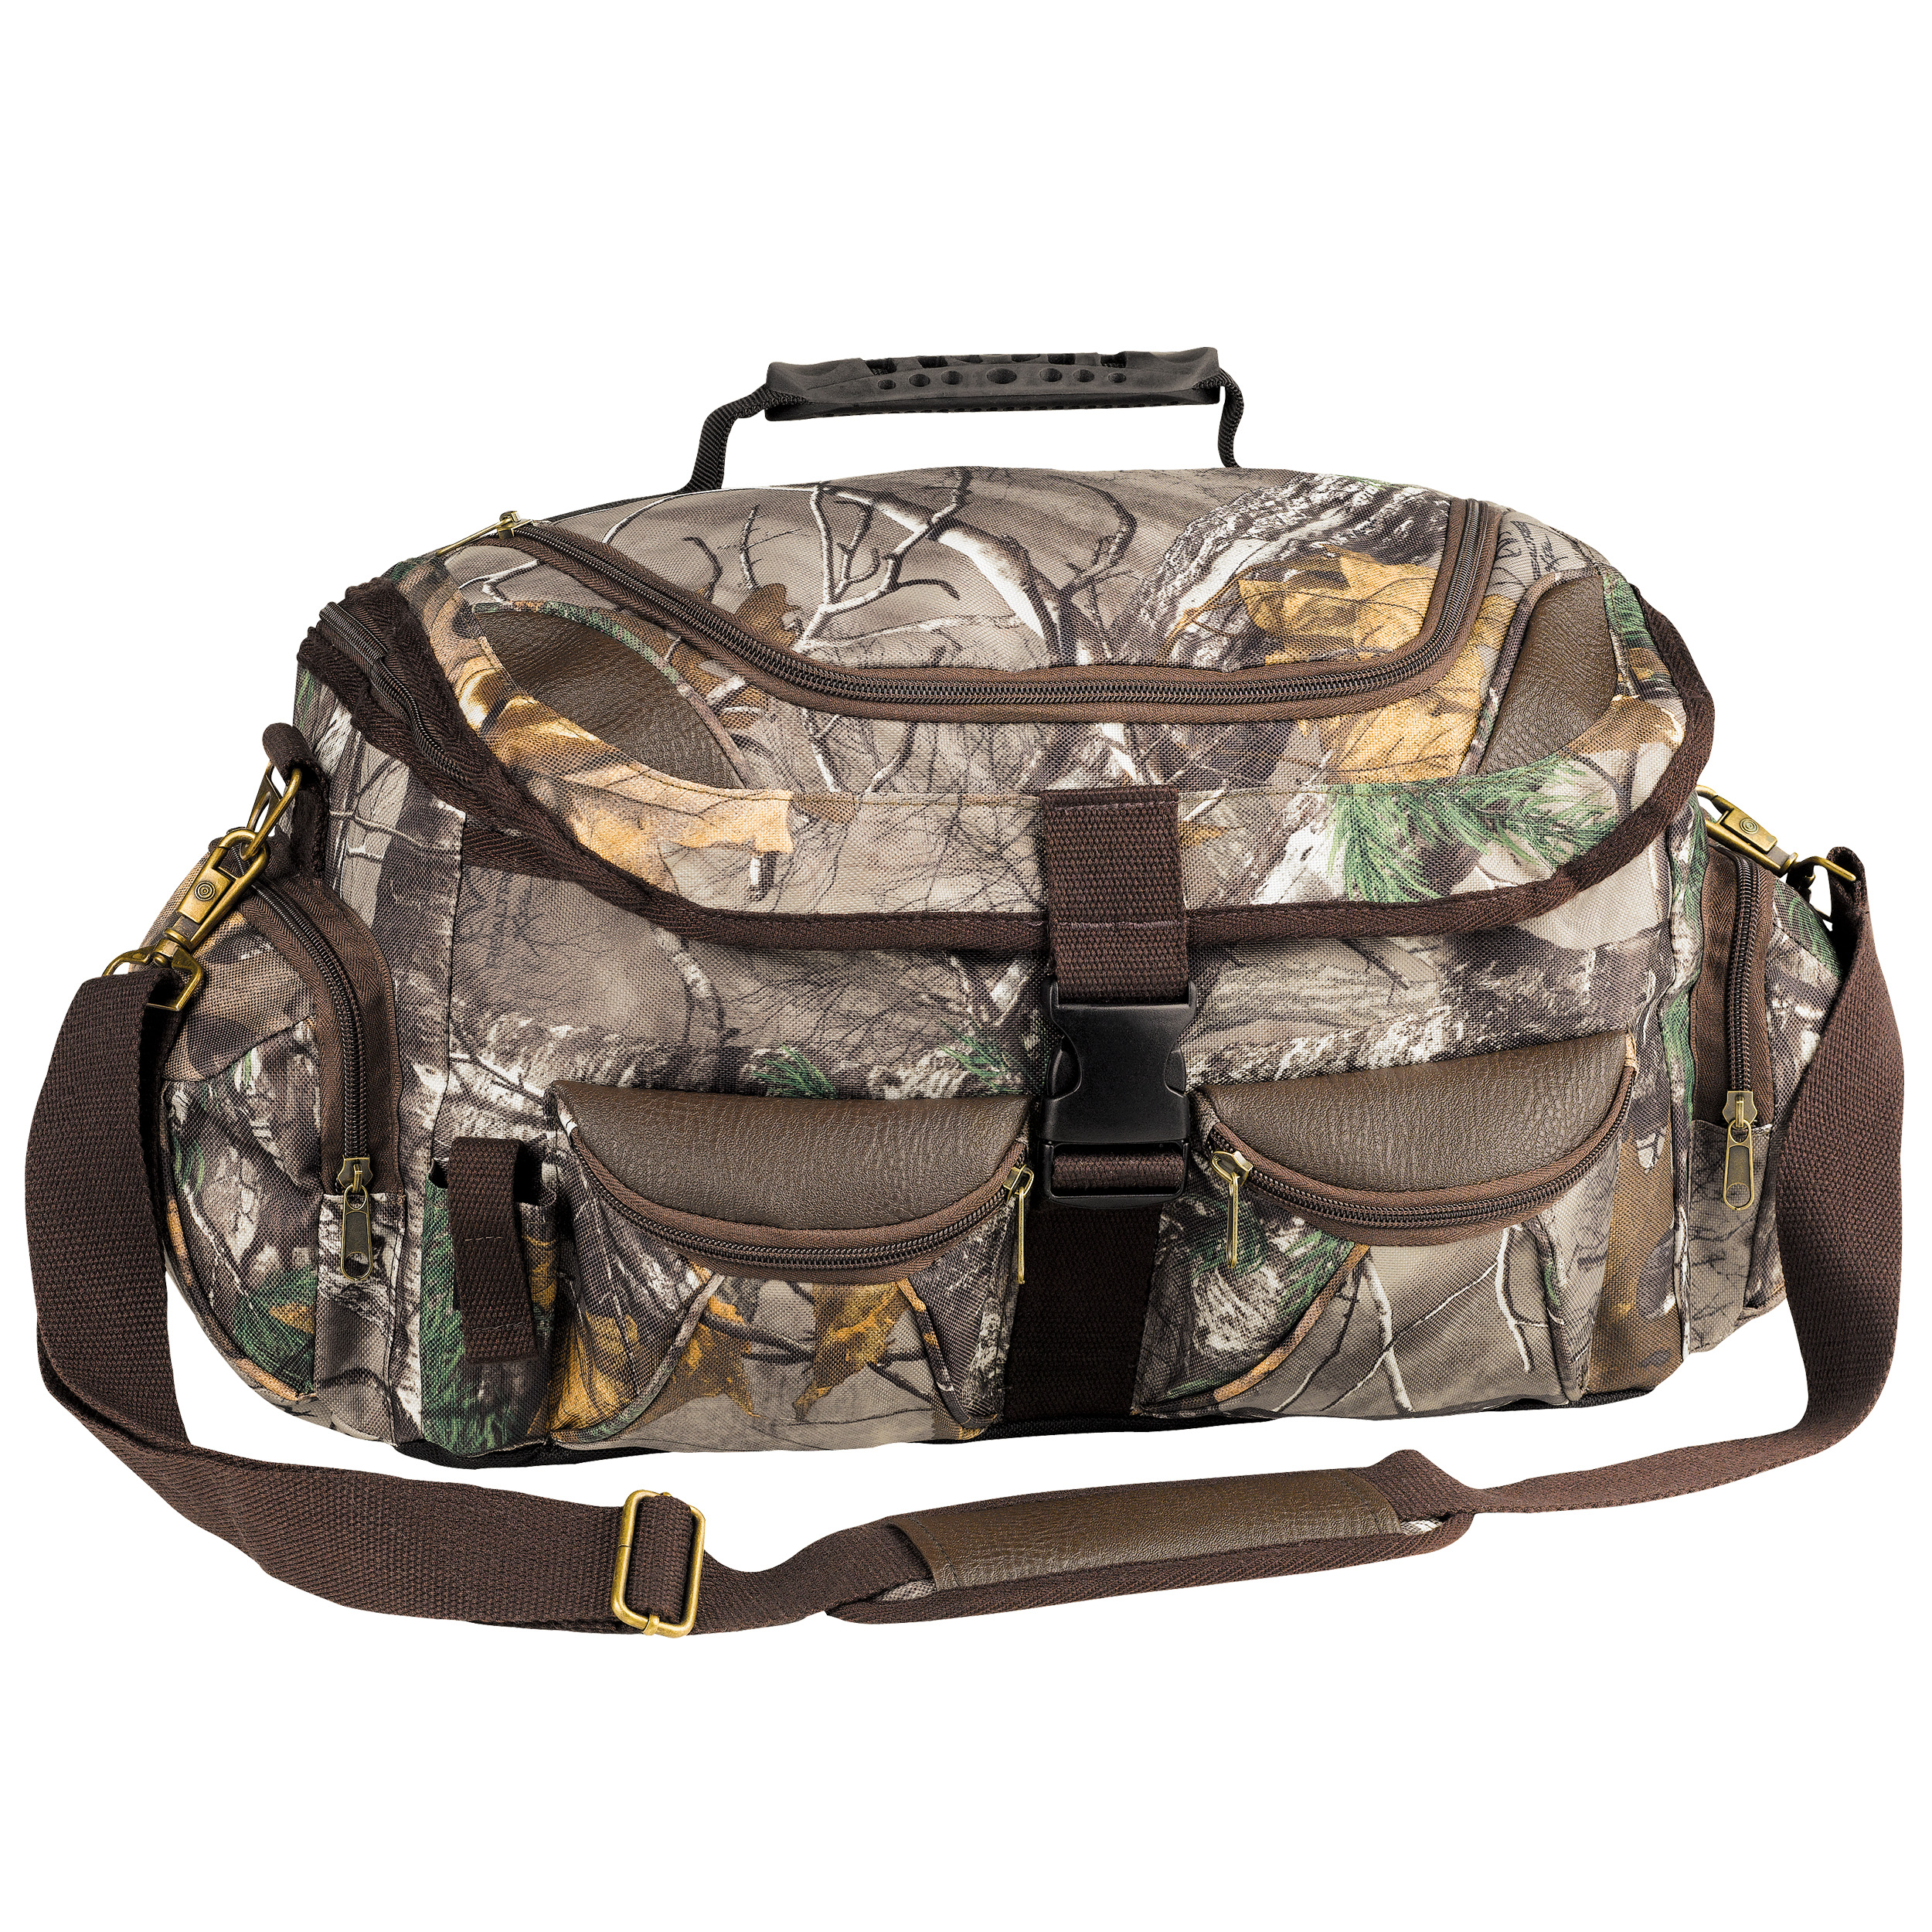 Travel - Duffels, Shoe Bags, Backpacks, +More